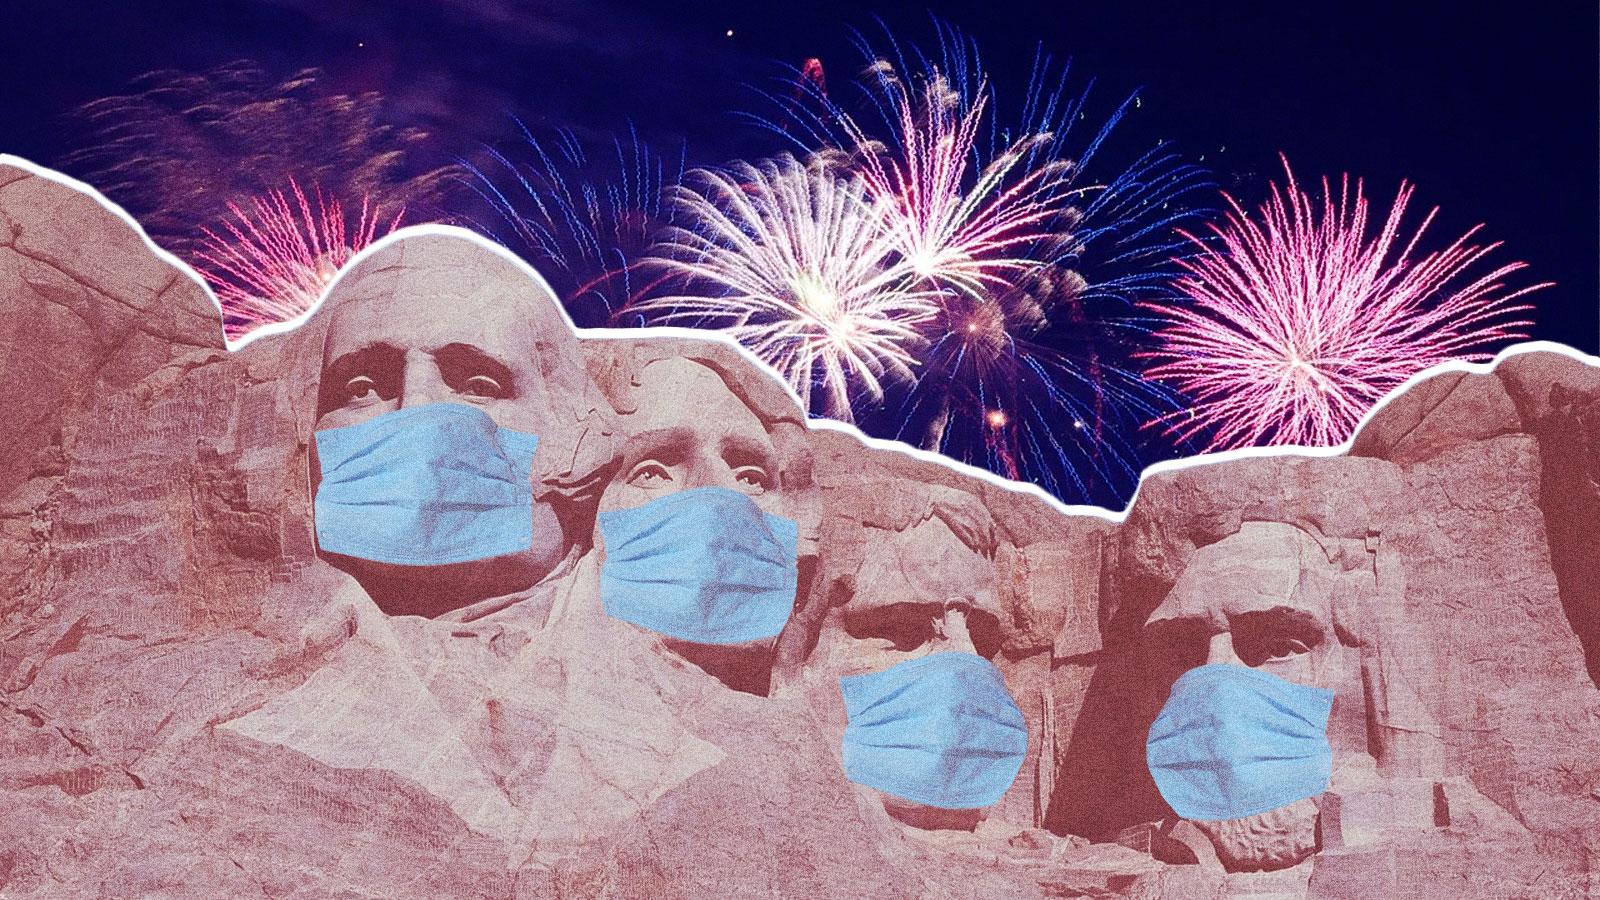 Fireworks behind Mount Rushmore